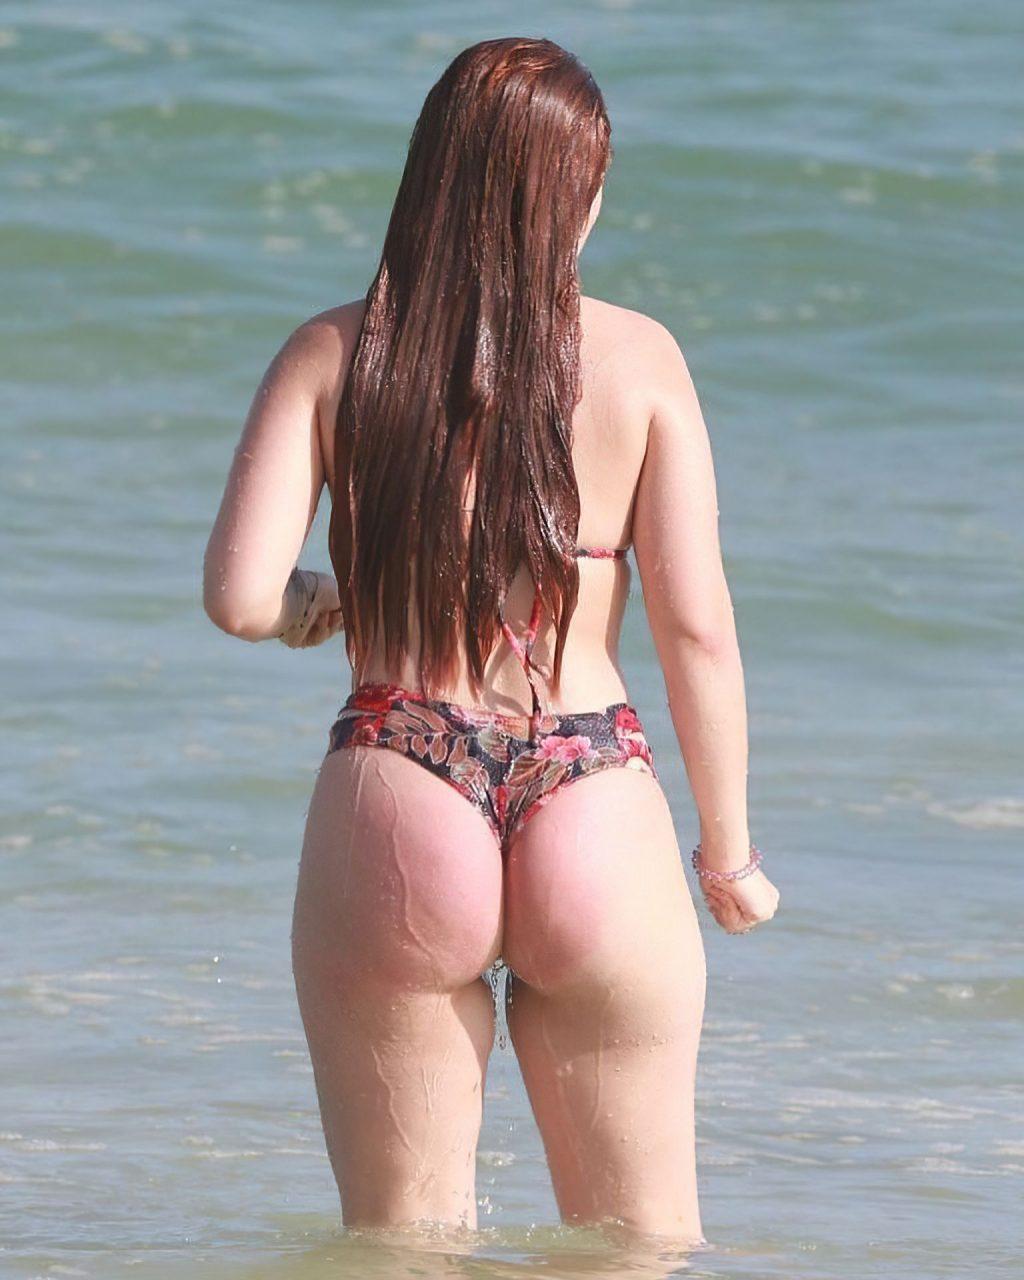 Larissa Manoela Displays Her Sexy Booty on the Beach (11 Photos)